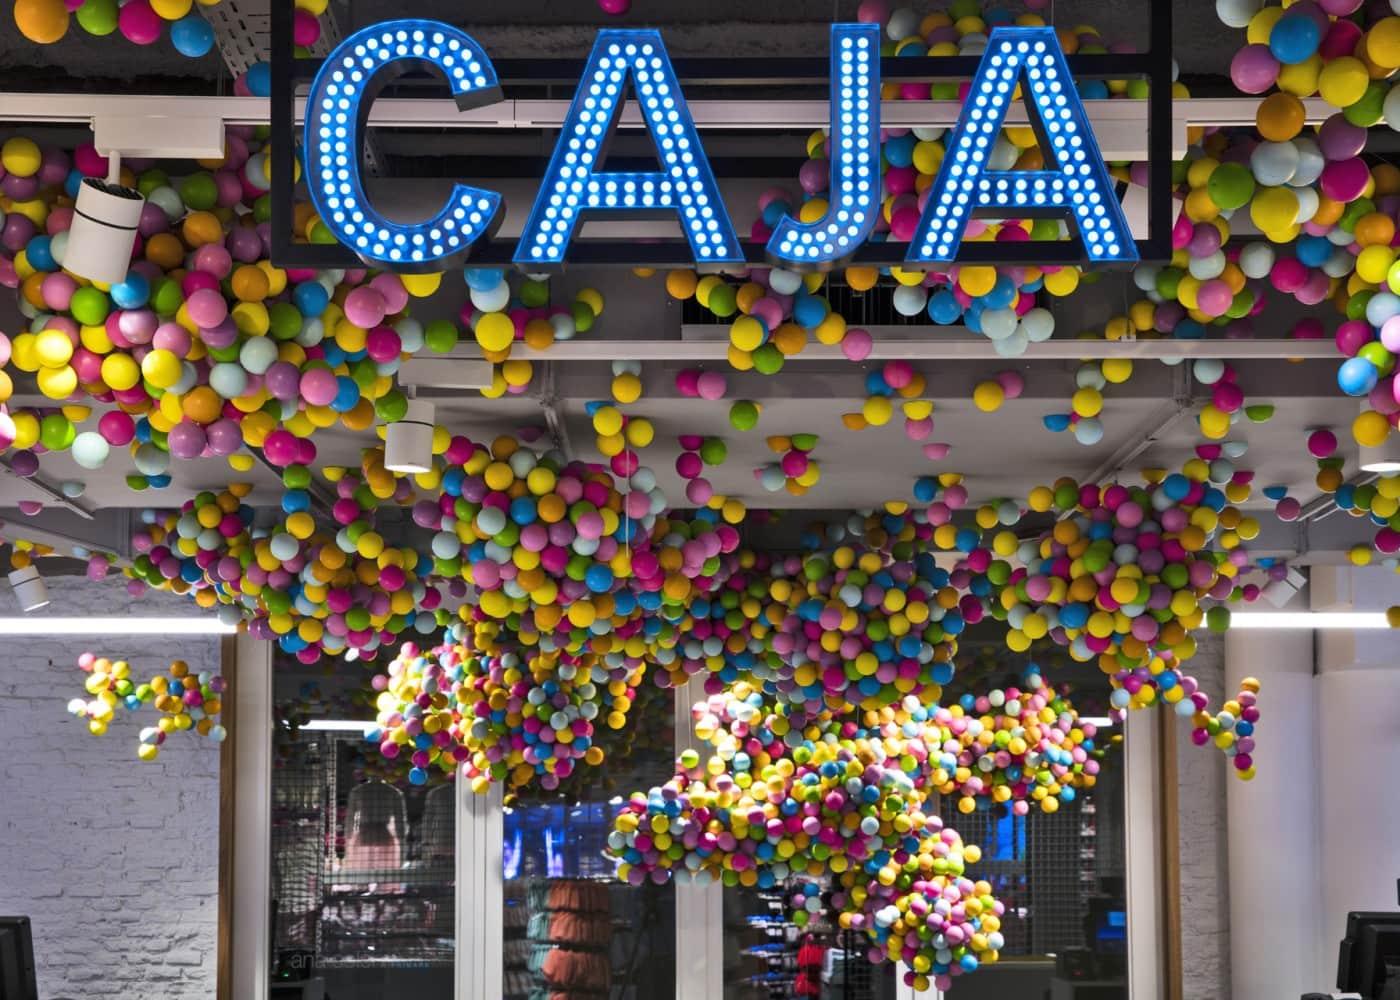 retail lighting design: Primark Madrid Gran Via store display